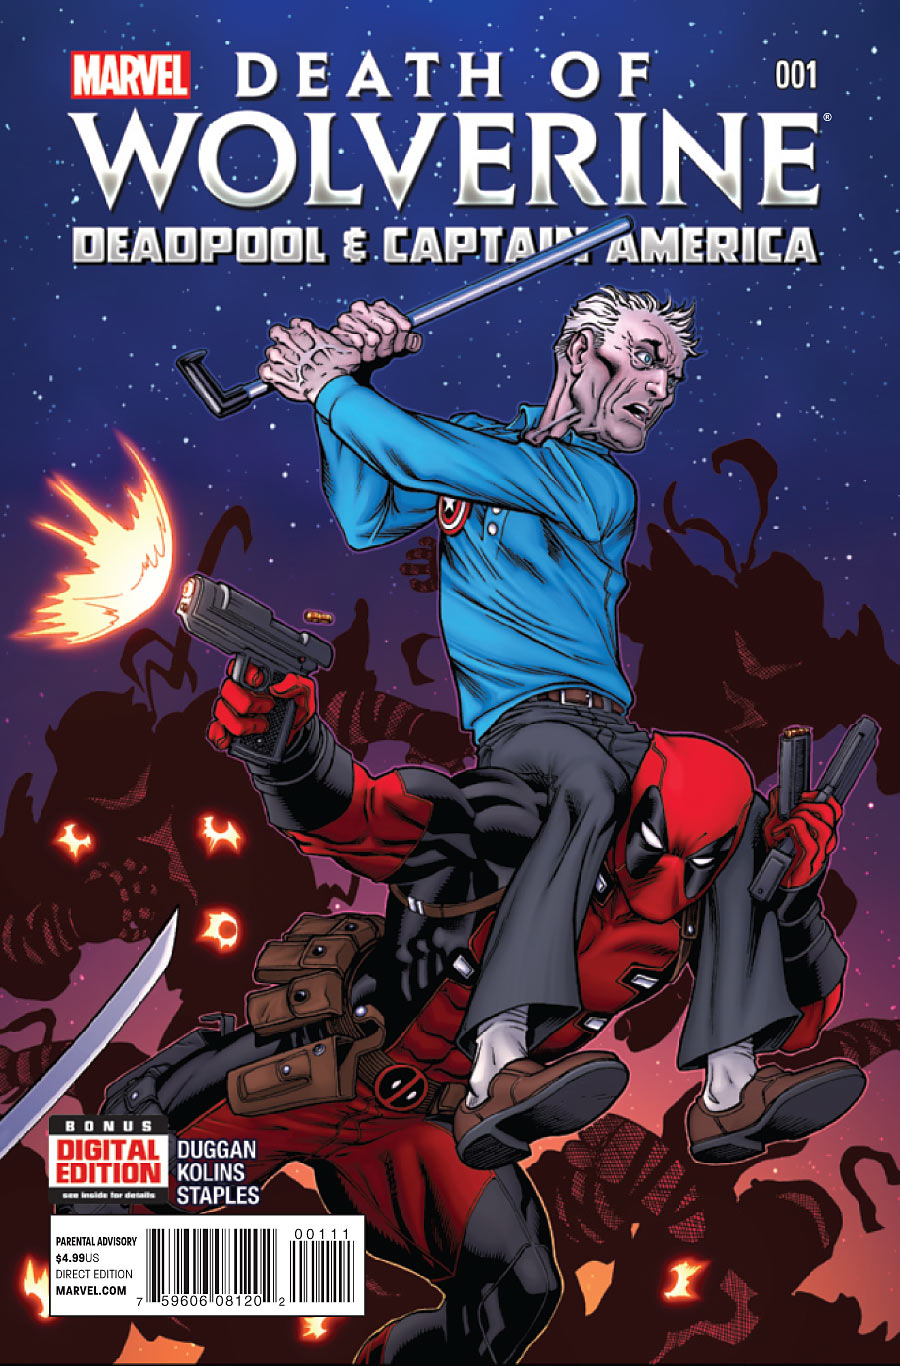 401594-avance-muerte-lobezno-masacre-capitan-america.jpg